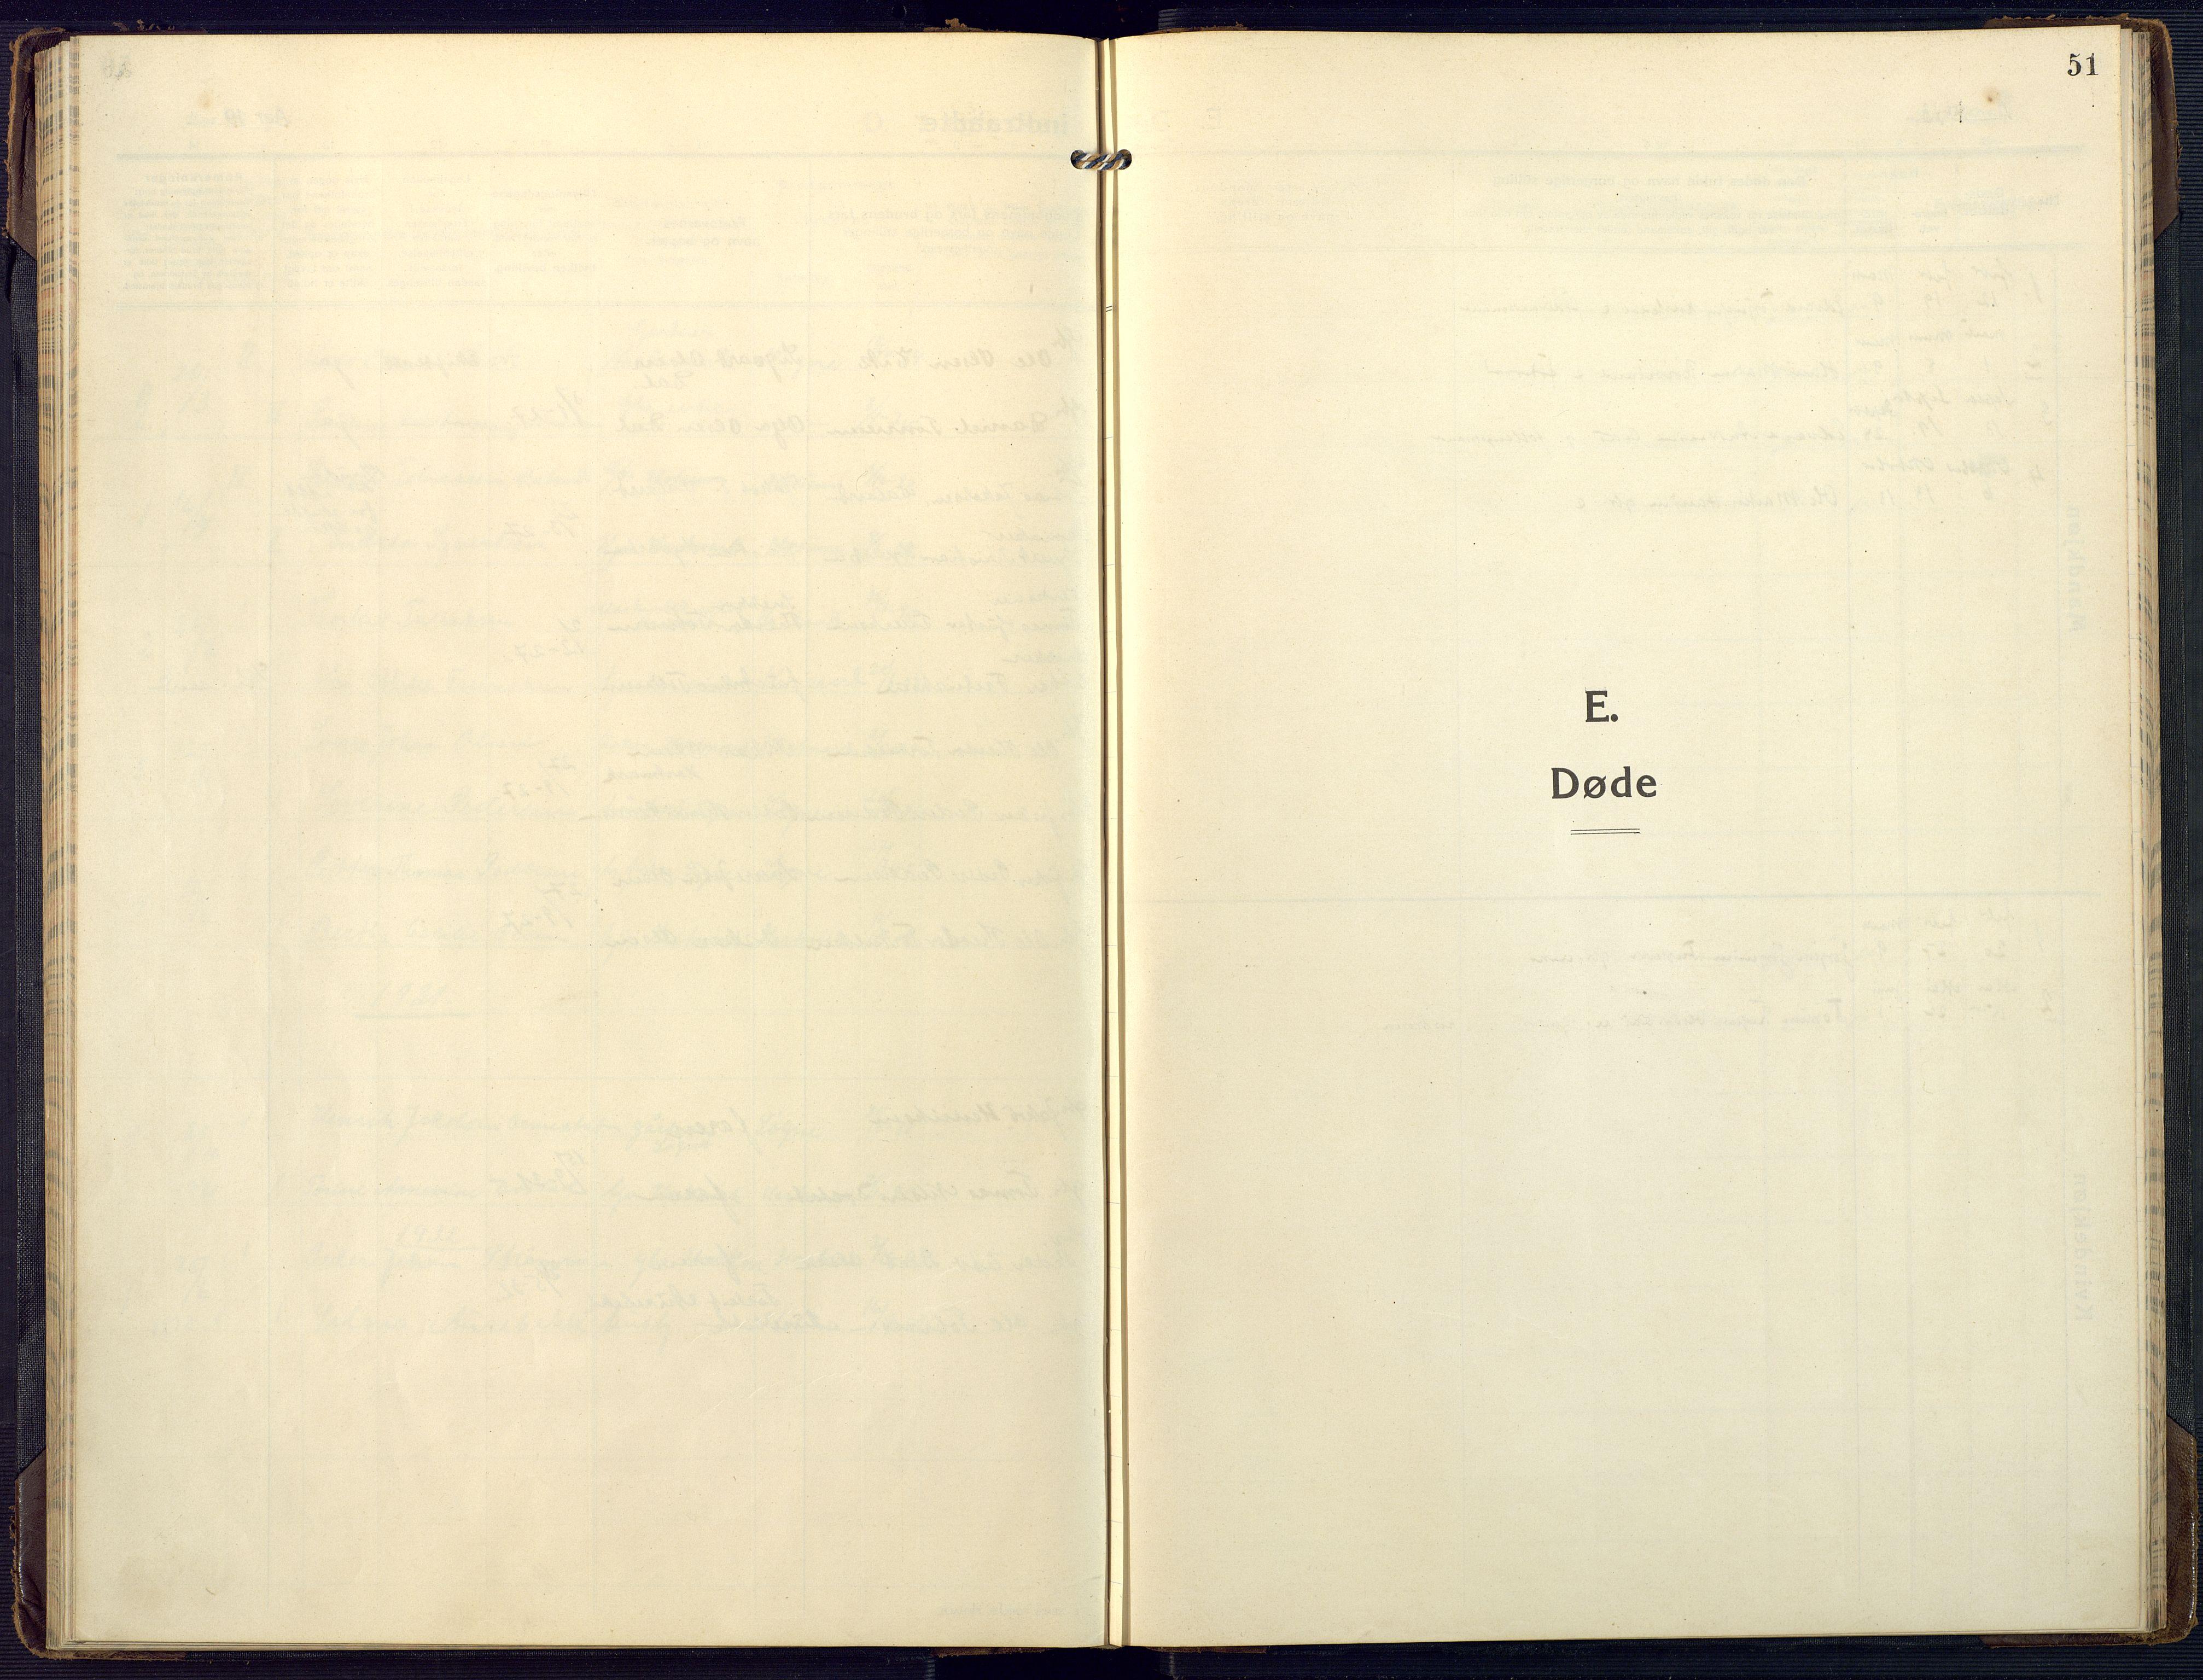 SAK, Mandal sokneprestkontor, F/Fa/Fab/L0003: Ministerialbok nr. A 3, 1913-1933, s. 51